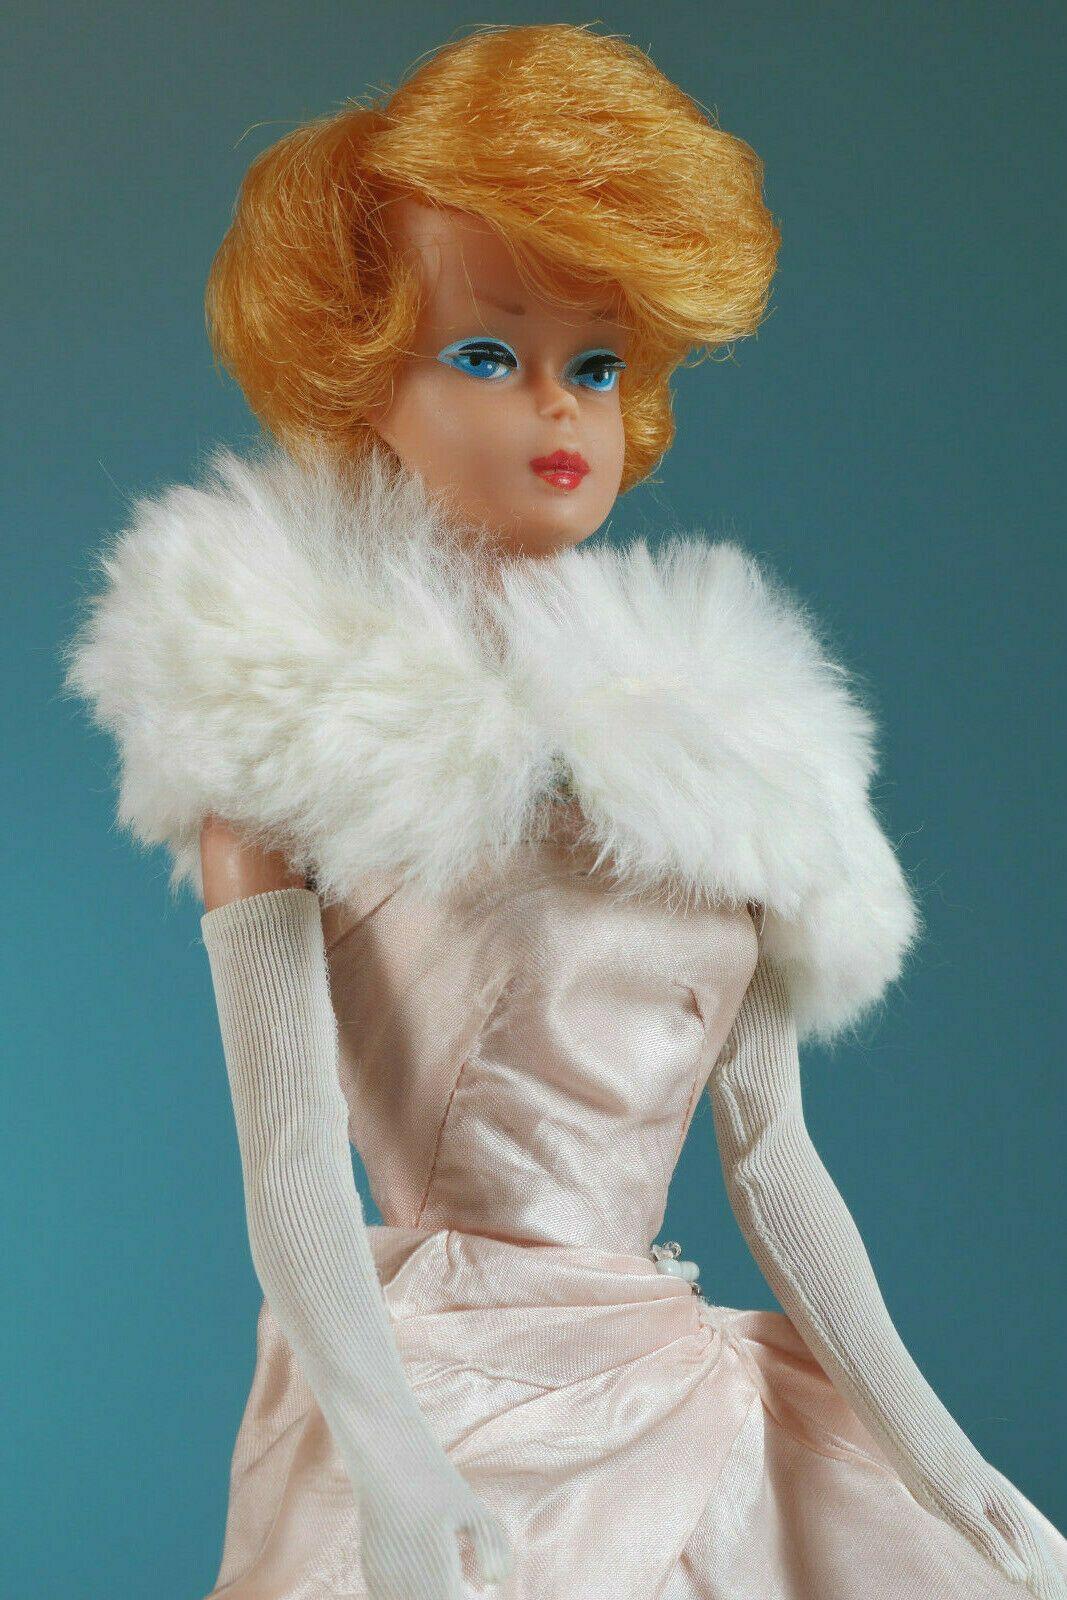 Vintage Barbie Bubblecut Sidepart Strawberry Blonde Ebay Vintage Barbie Mattel Sidepart Ebay Vintage Barbie Dress Vintage Barbie Clothes Vintage Barbie